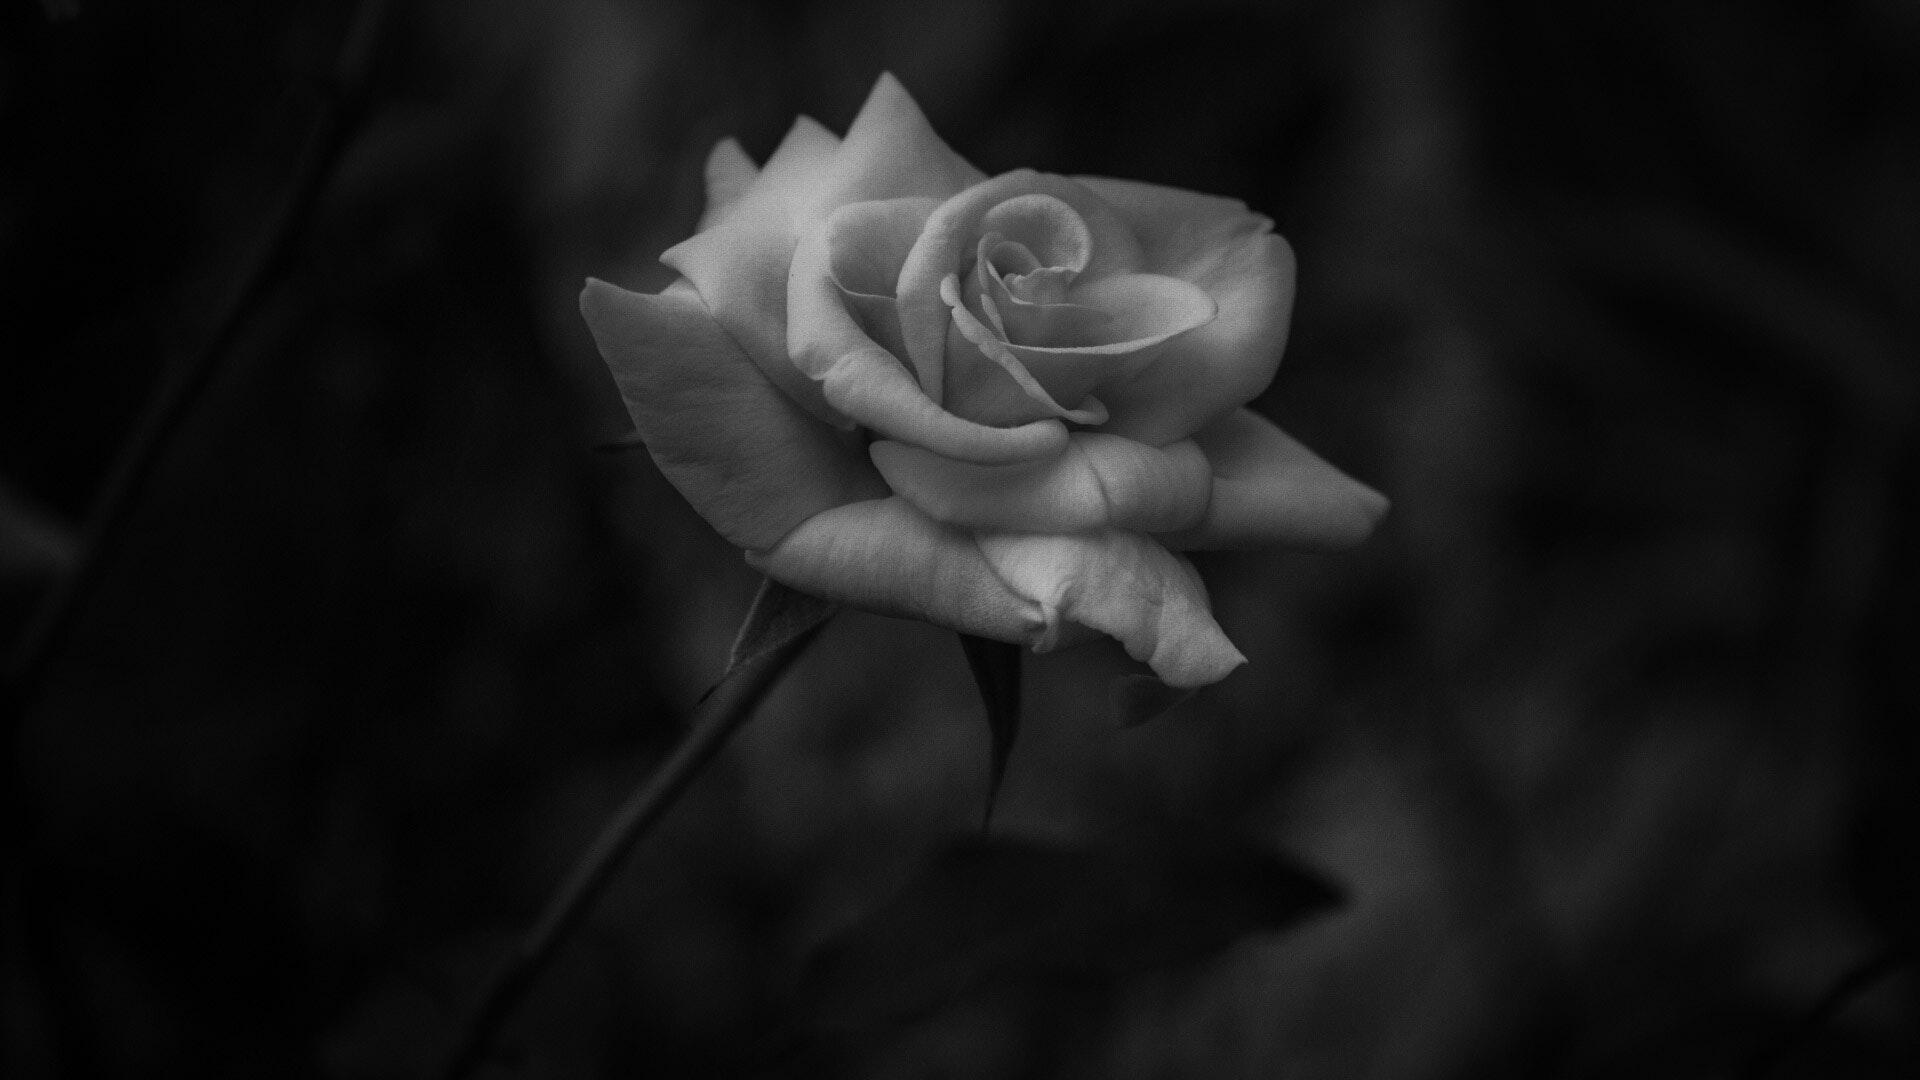 Free stock photo of beautiful flowers beauty dark free download izmirmasajfo